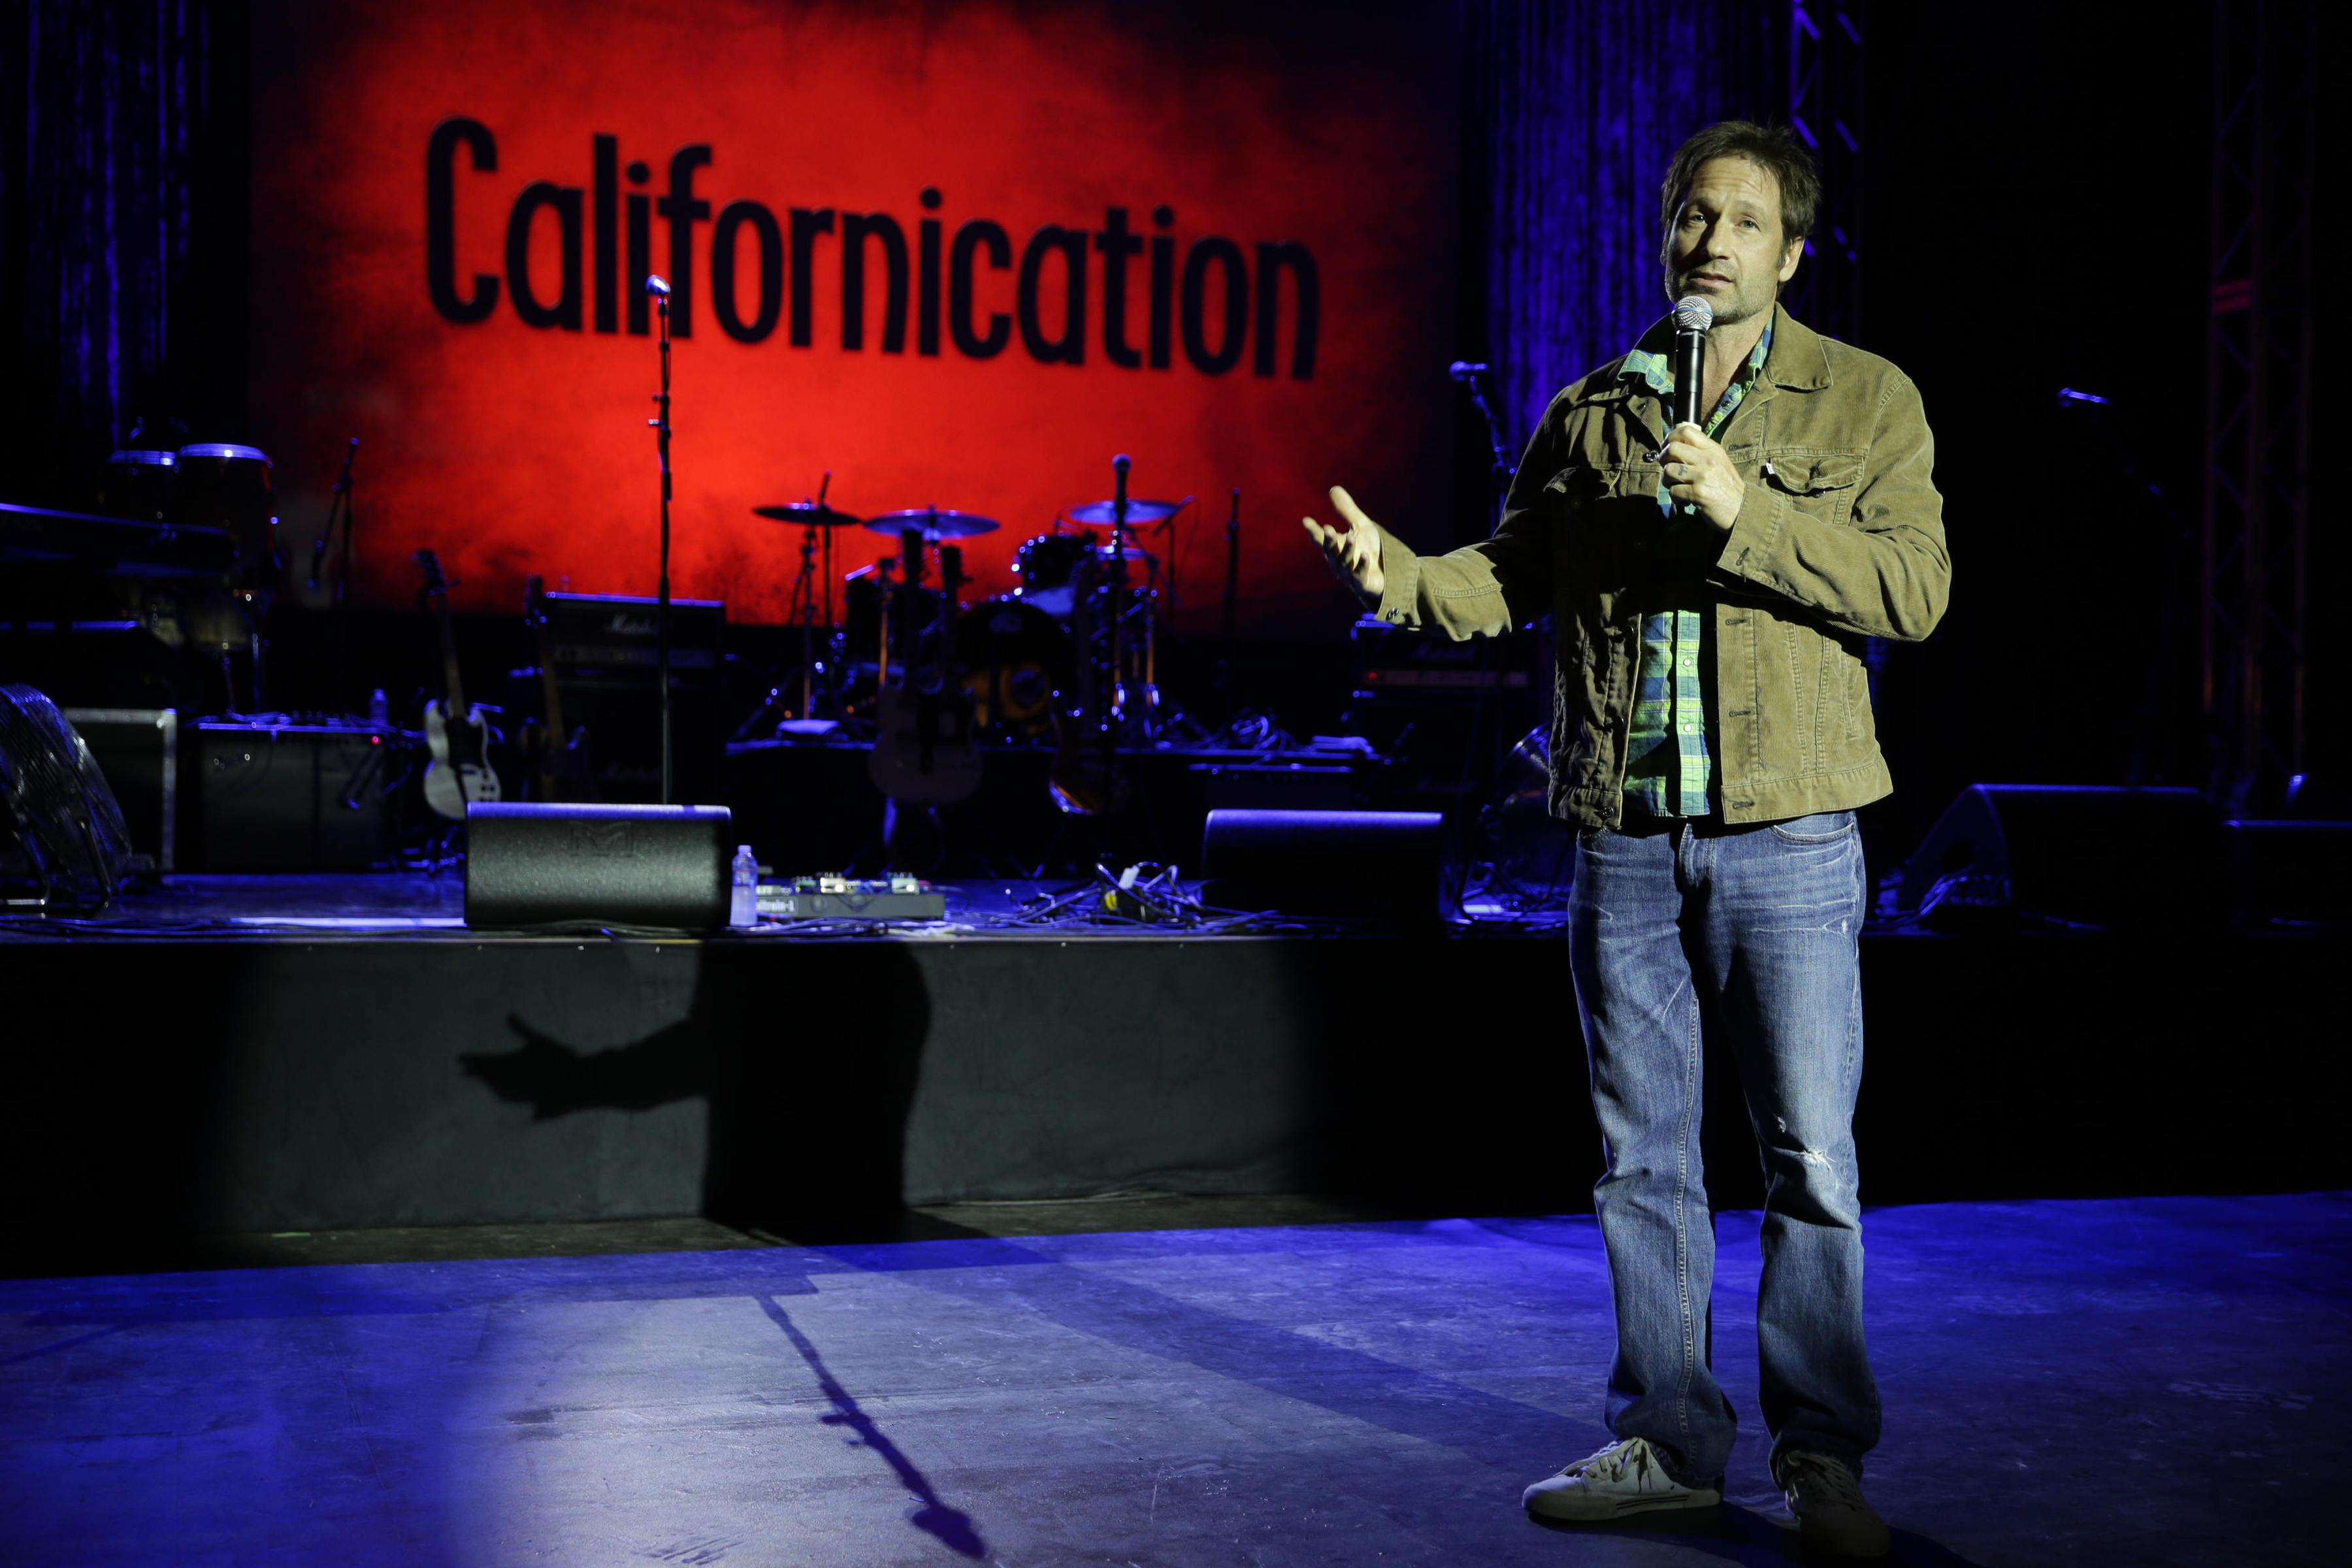 Californication - Season 7 - Wrap Party Photos (20)_FULL.jpg